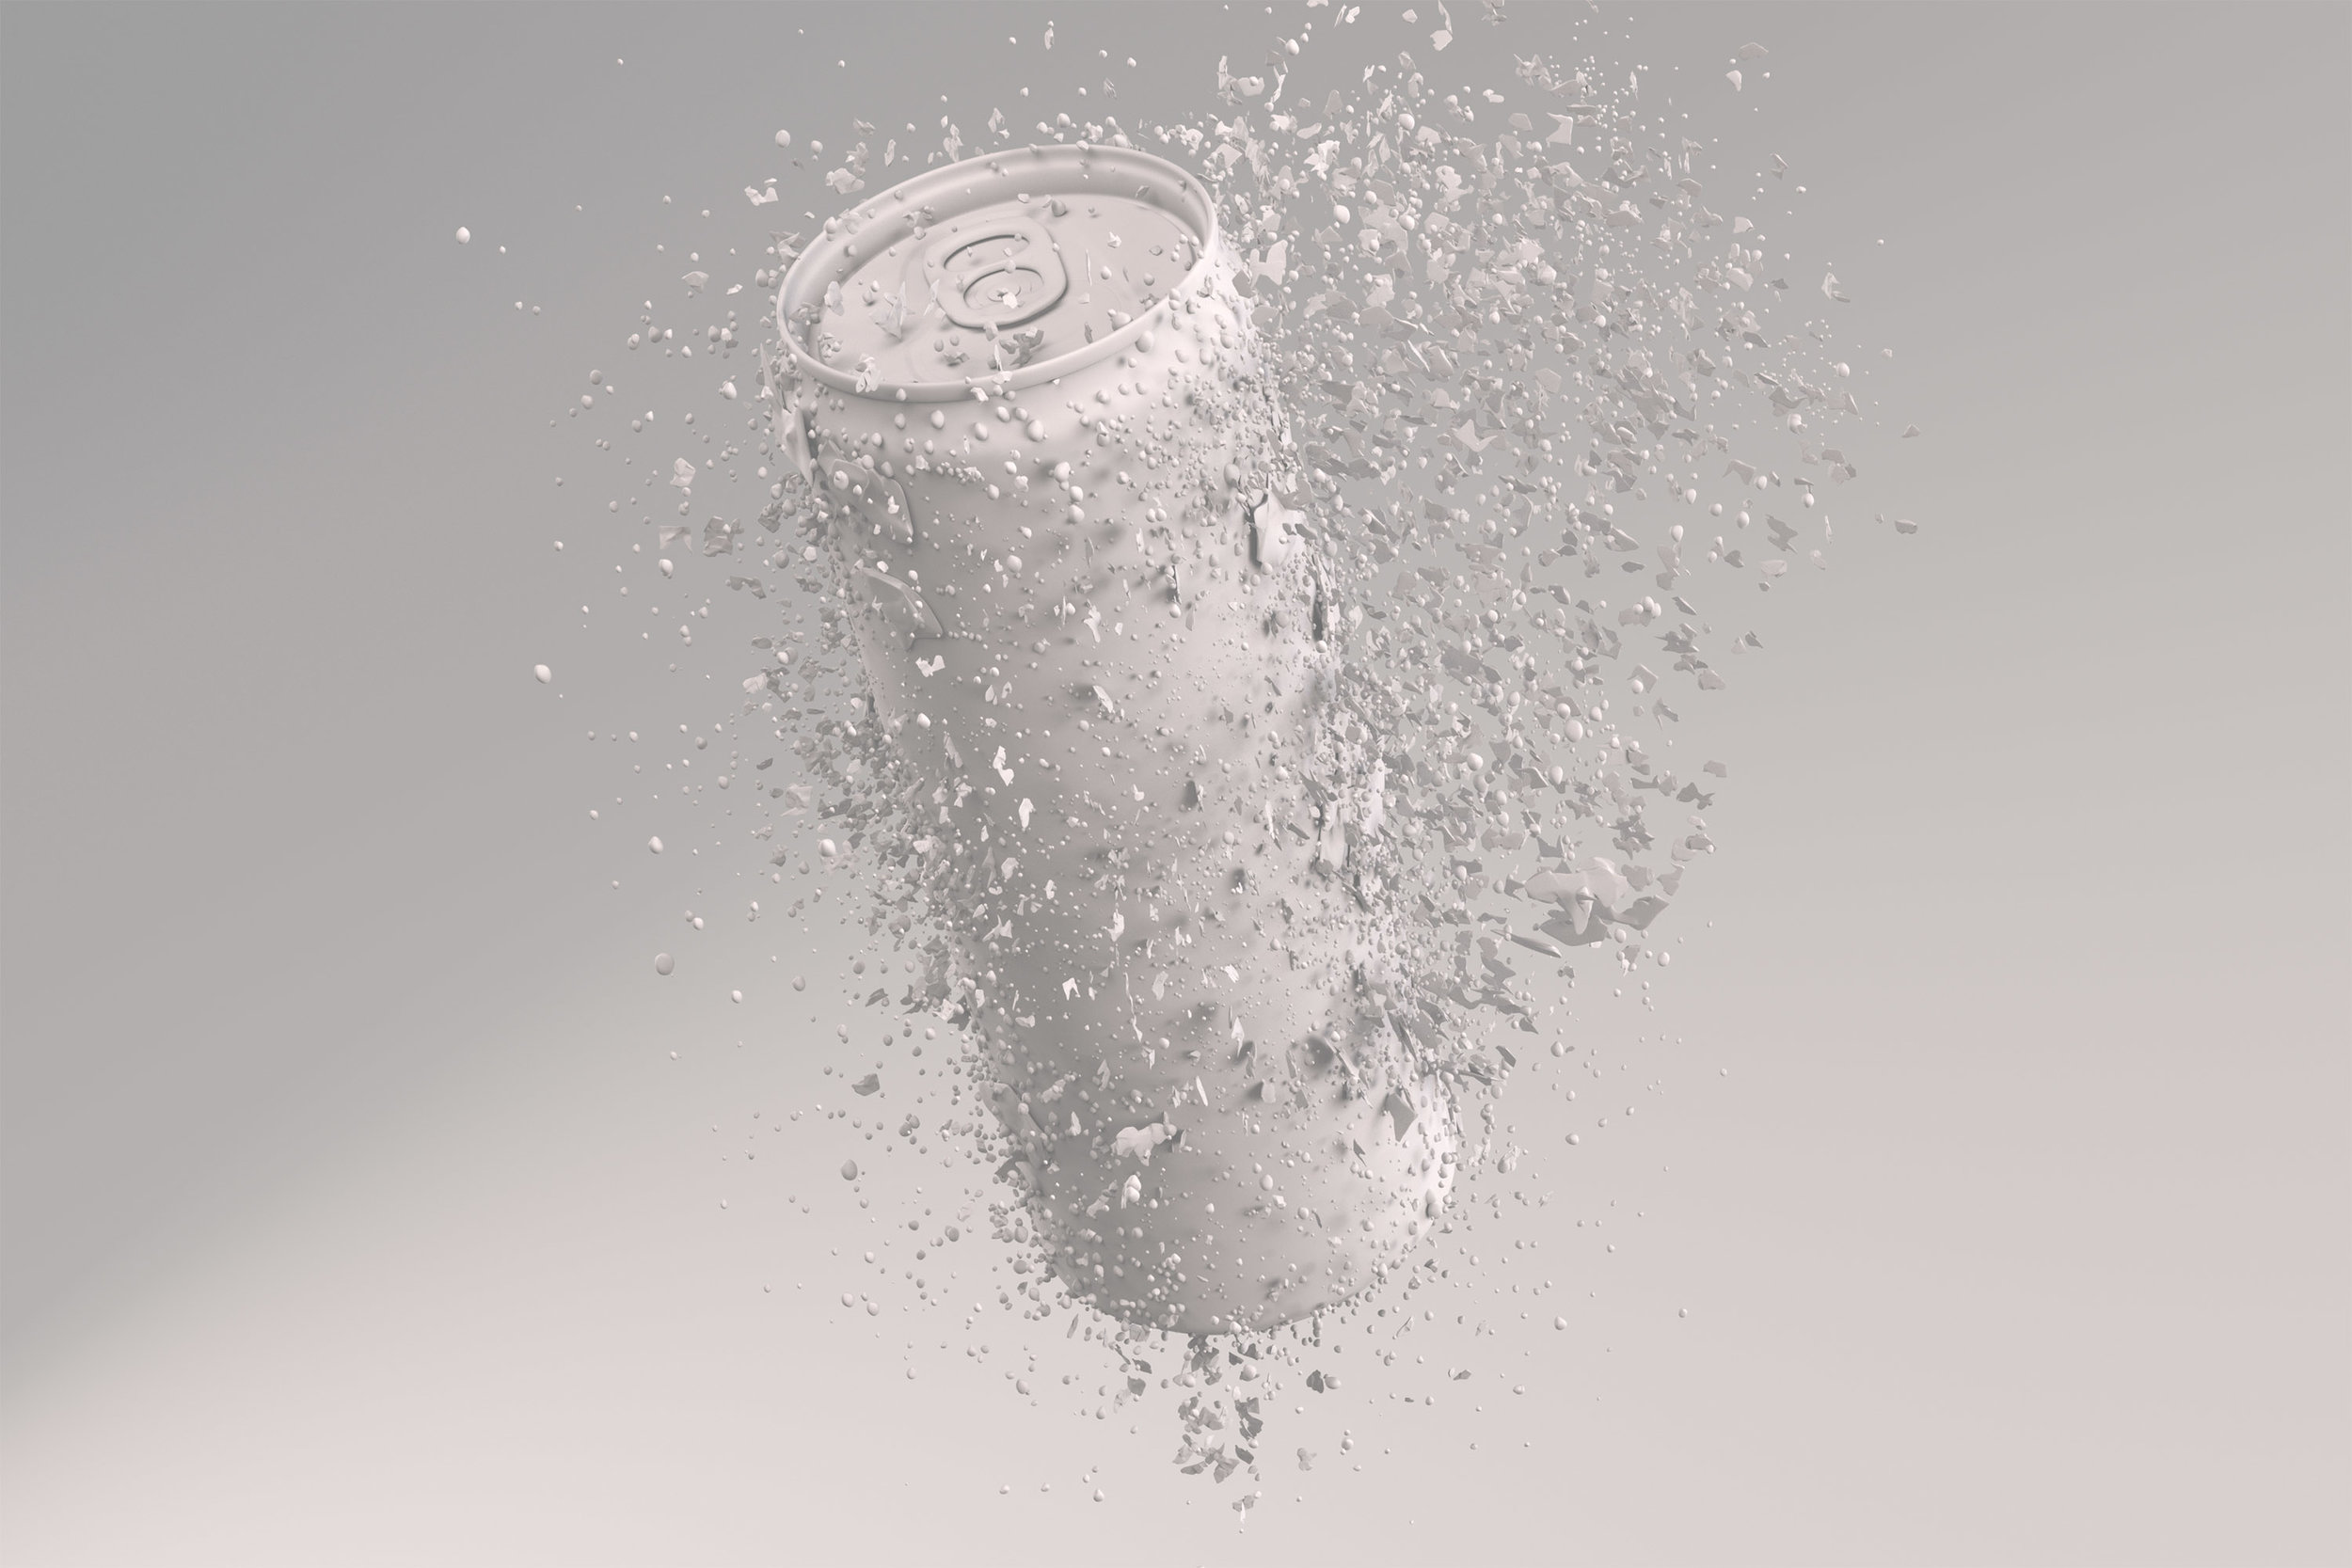 Coca Cola Classic - Tilt Snow - Metric - JHåland_1-diff.jpg